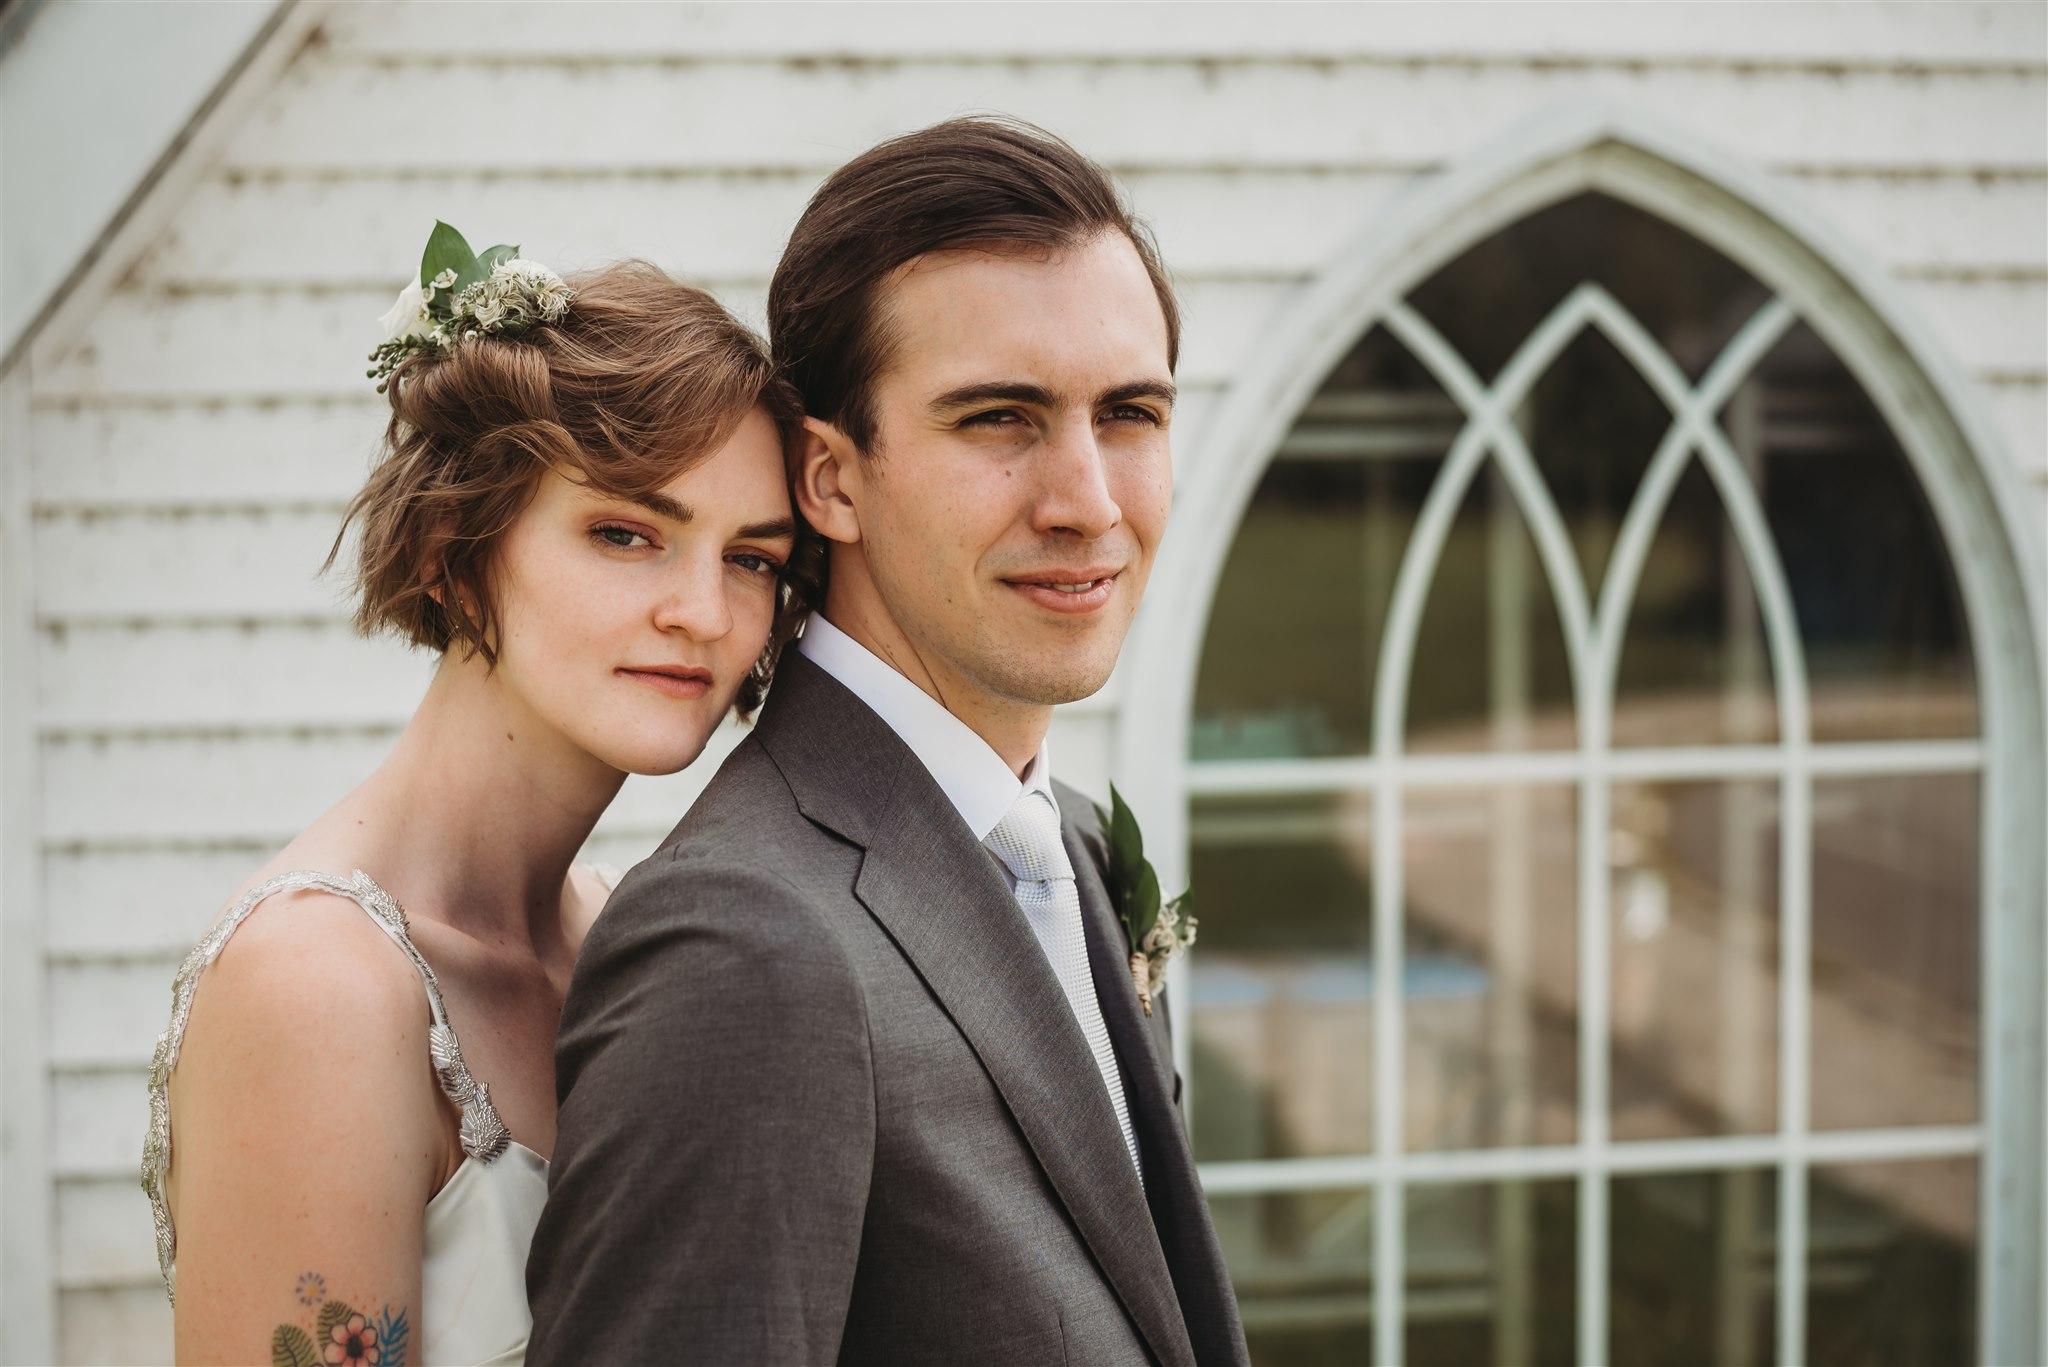 fanshawe conservation area wedding photos 382 1 - Watson Porter Pavillion Wedding